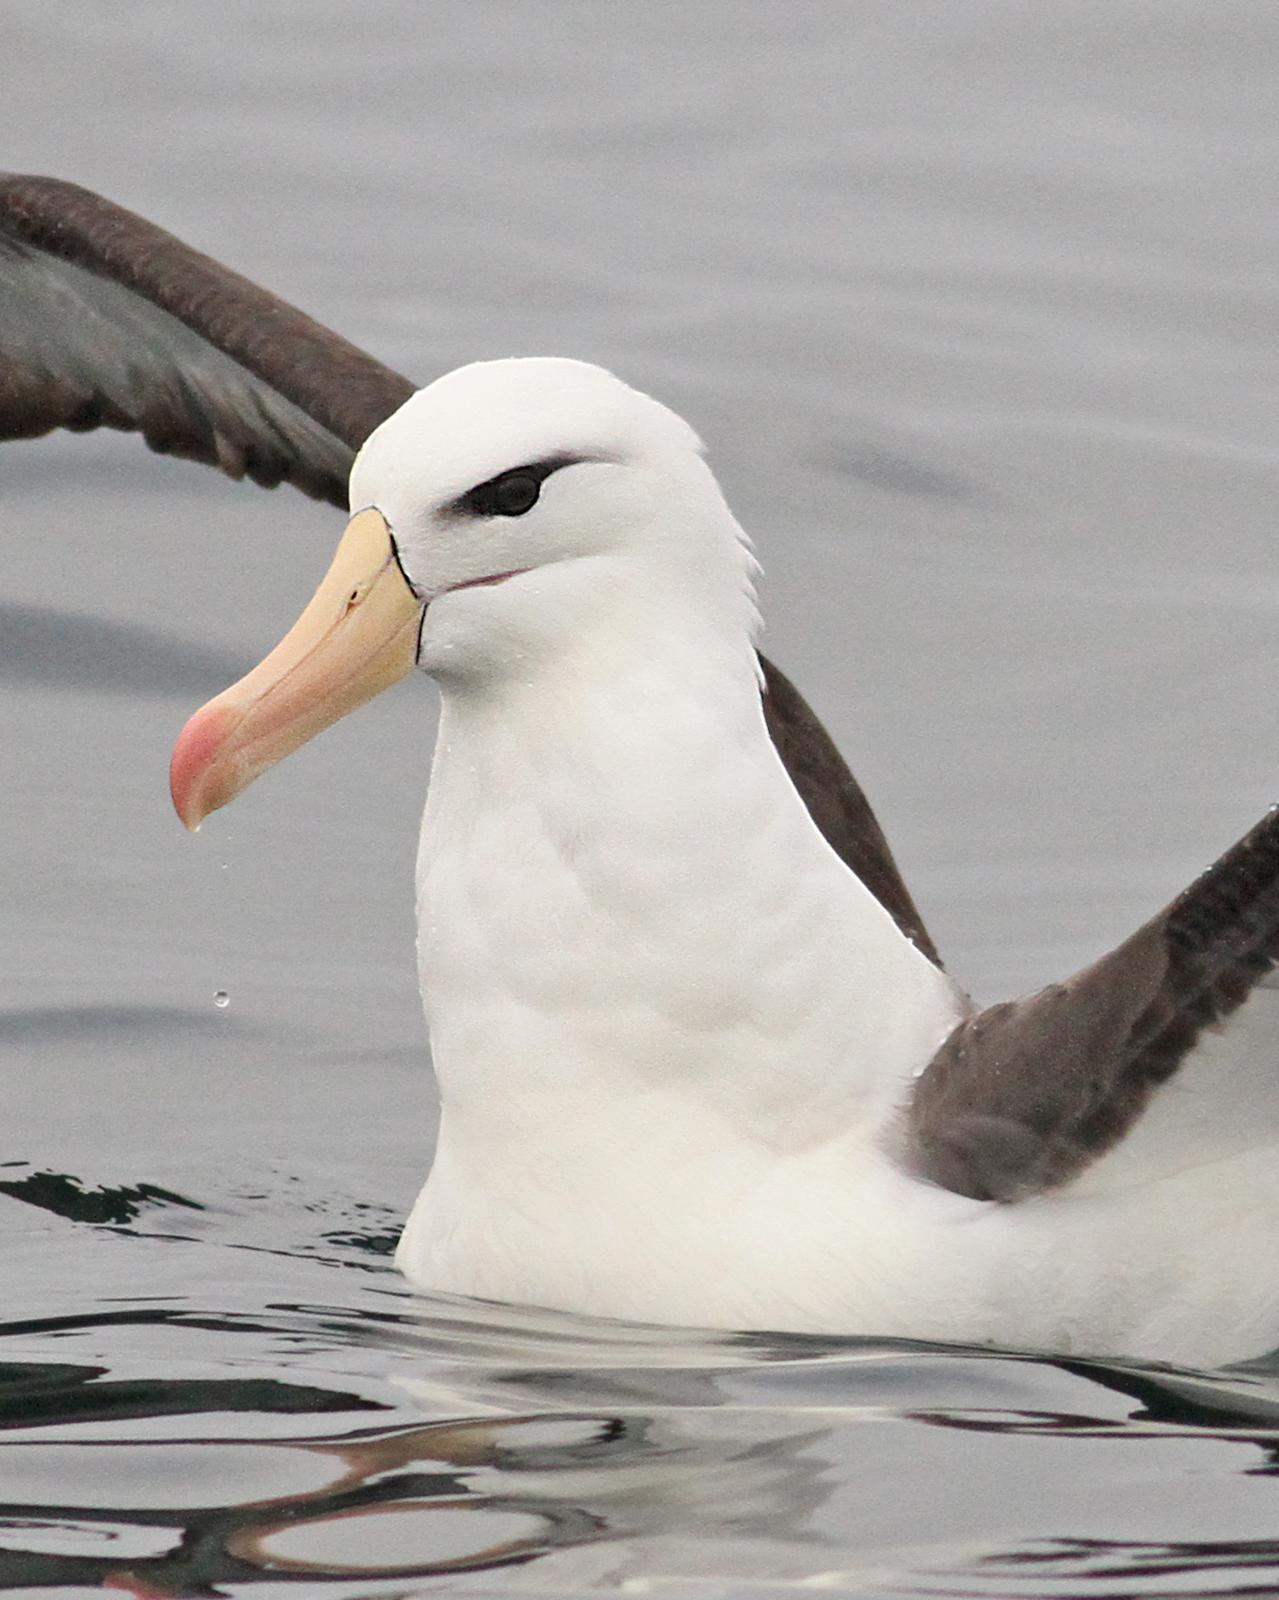 Black-browed Albatross Photo by Luke Seitz